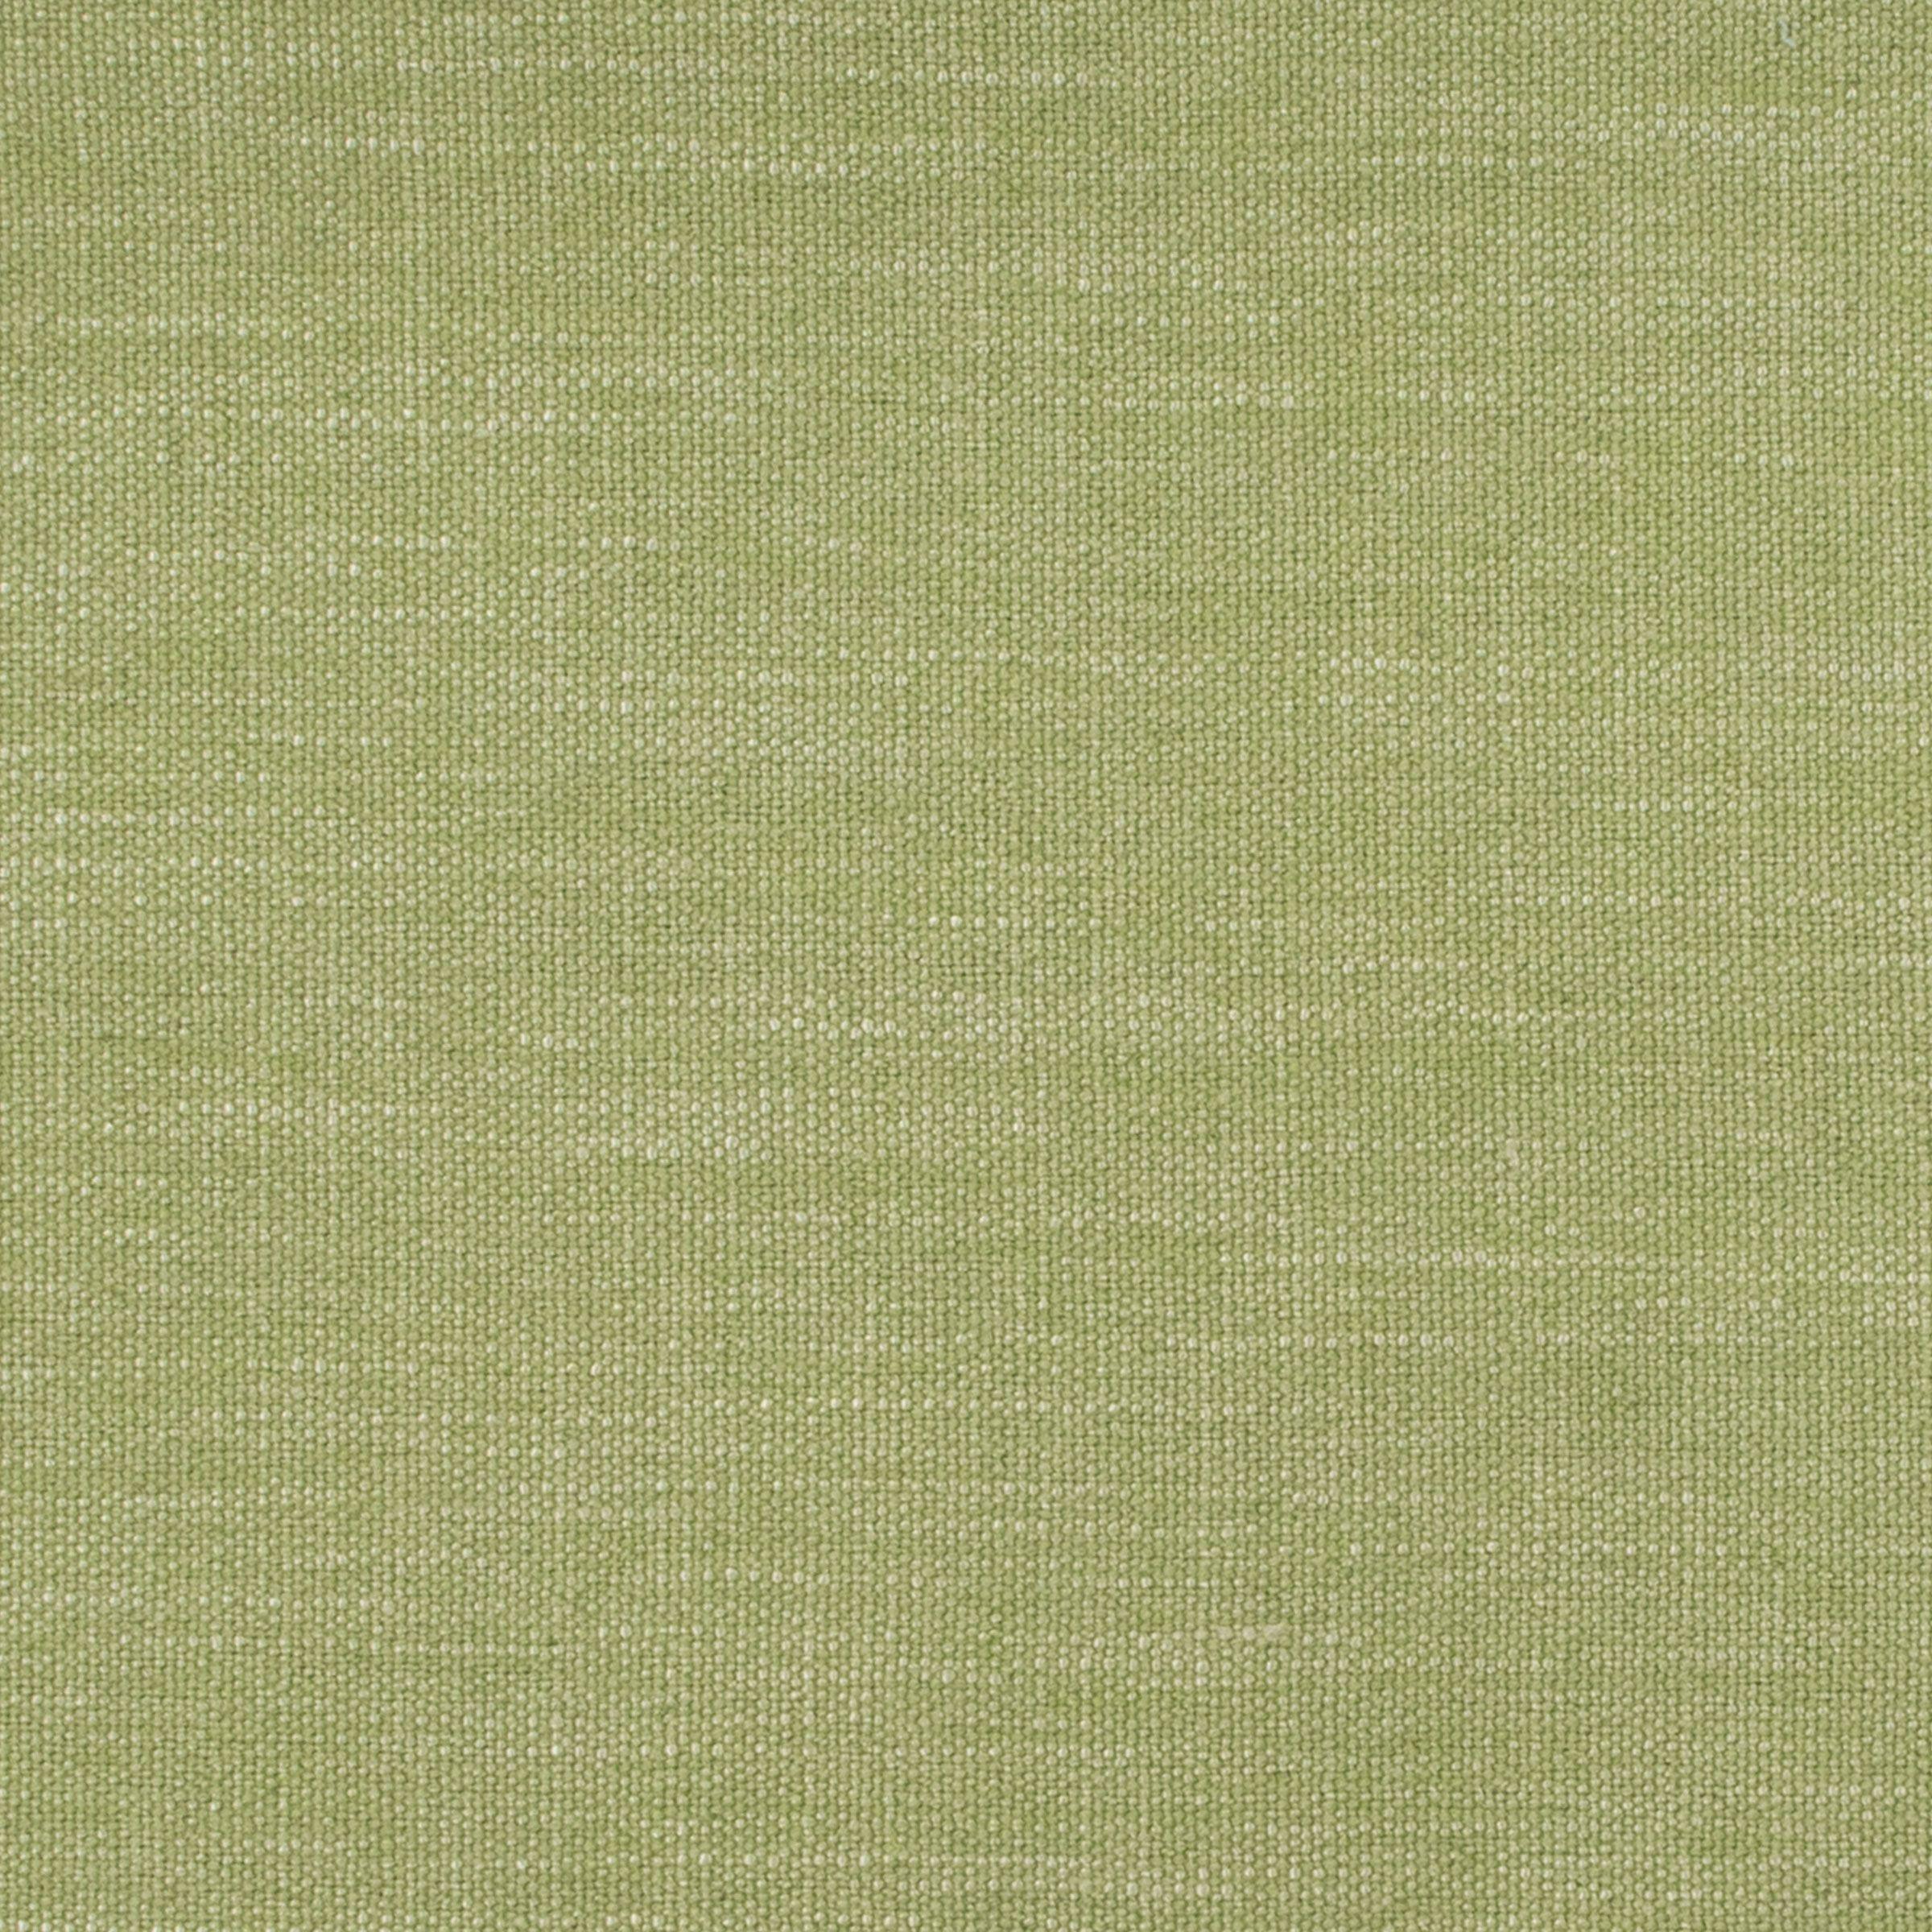 B9315 Grass Greenhouse fabrics, Fabric, Green fabric